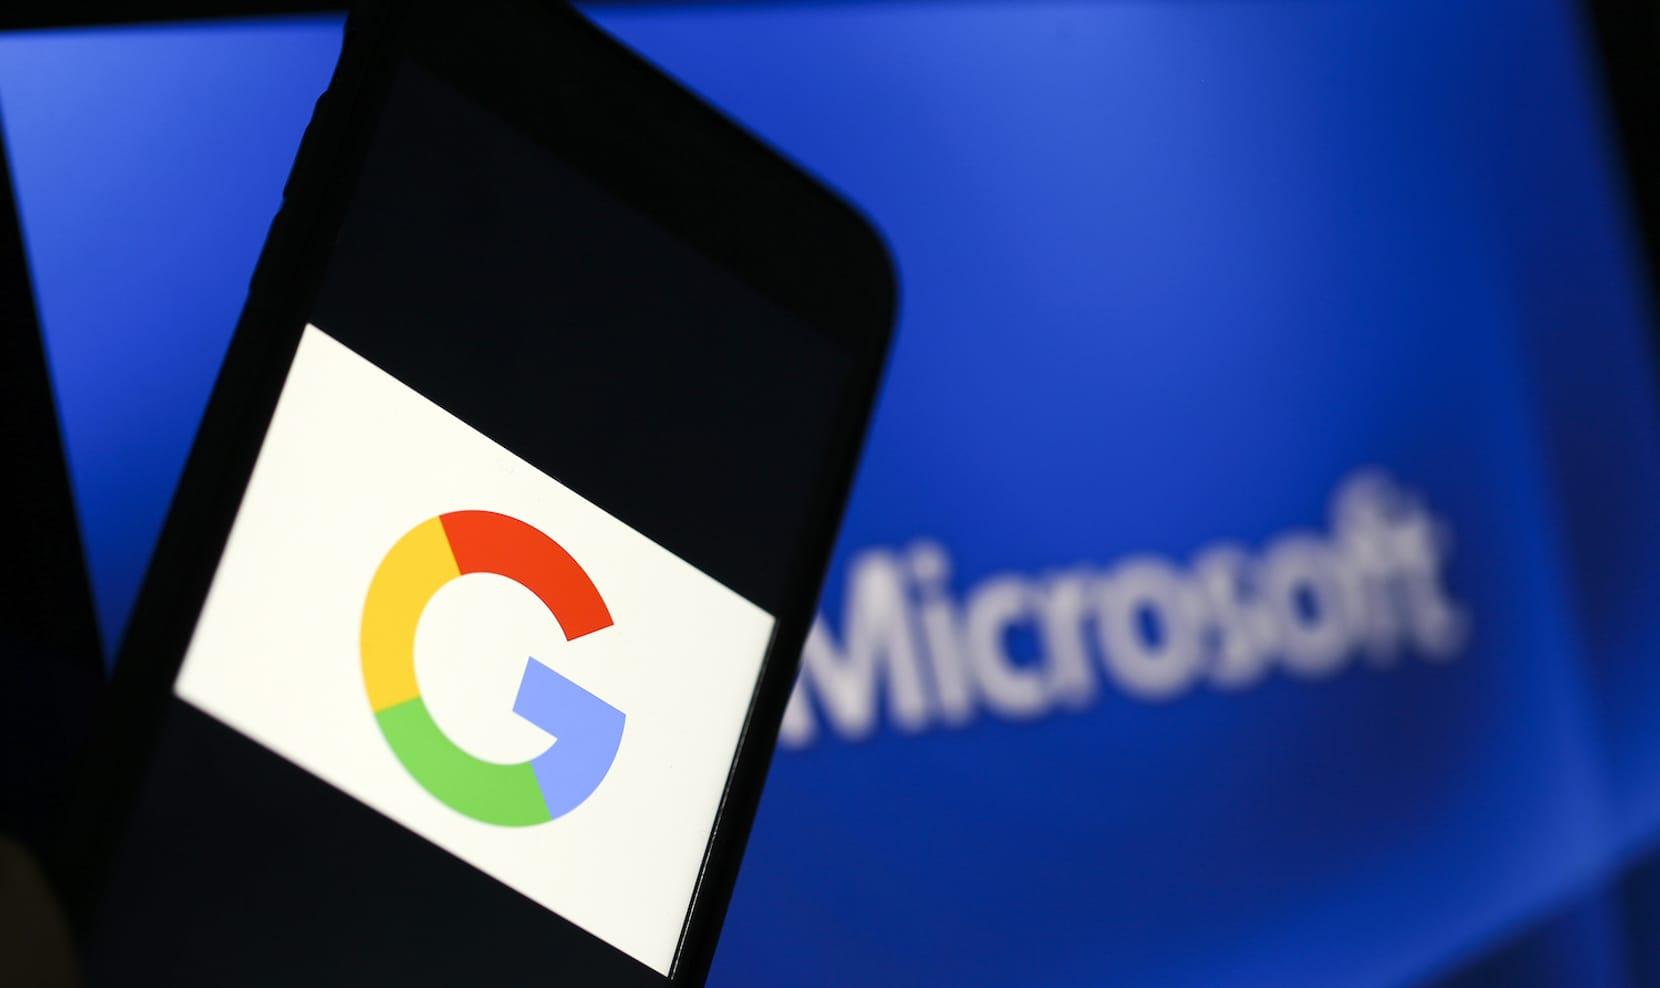 Google and Microsoft logos